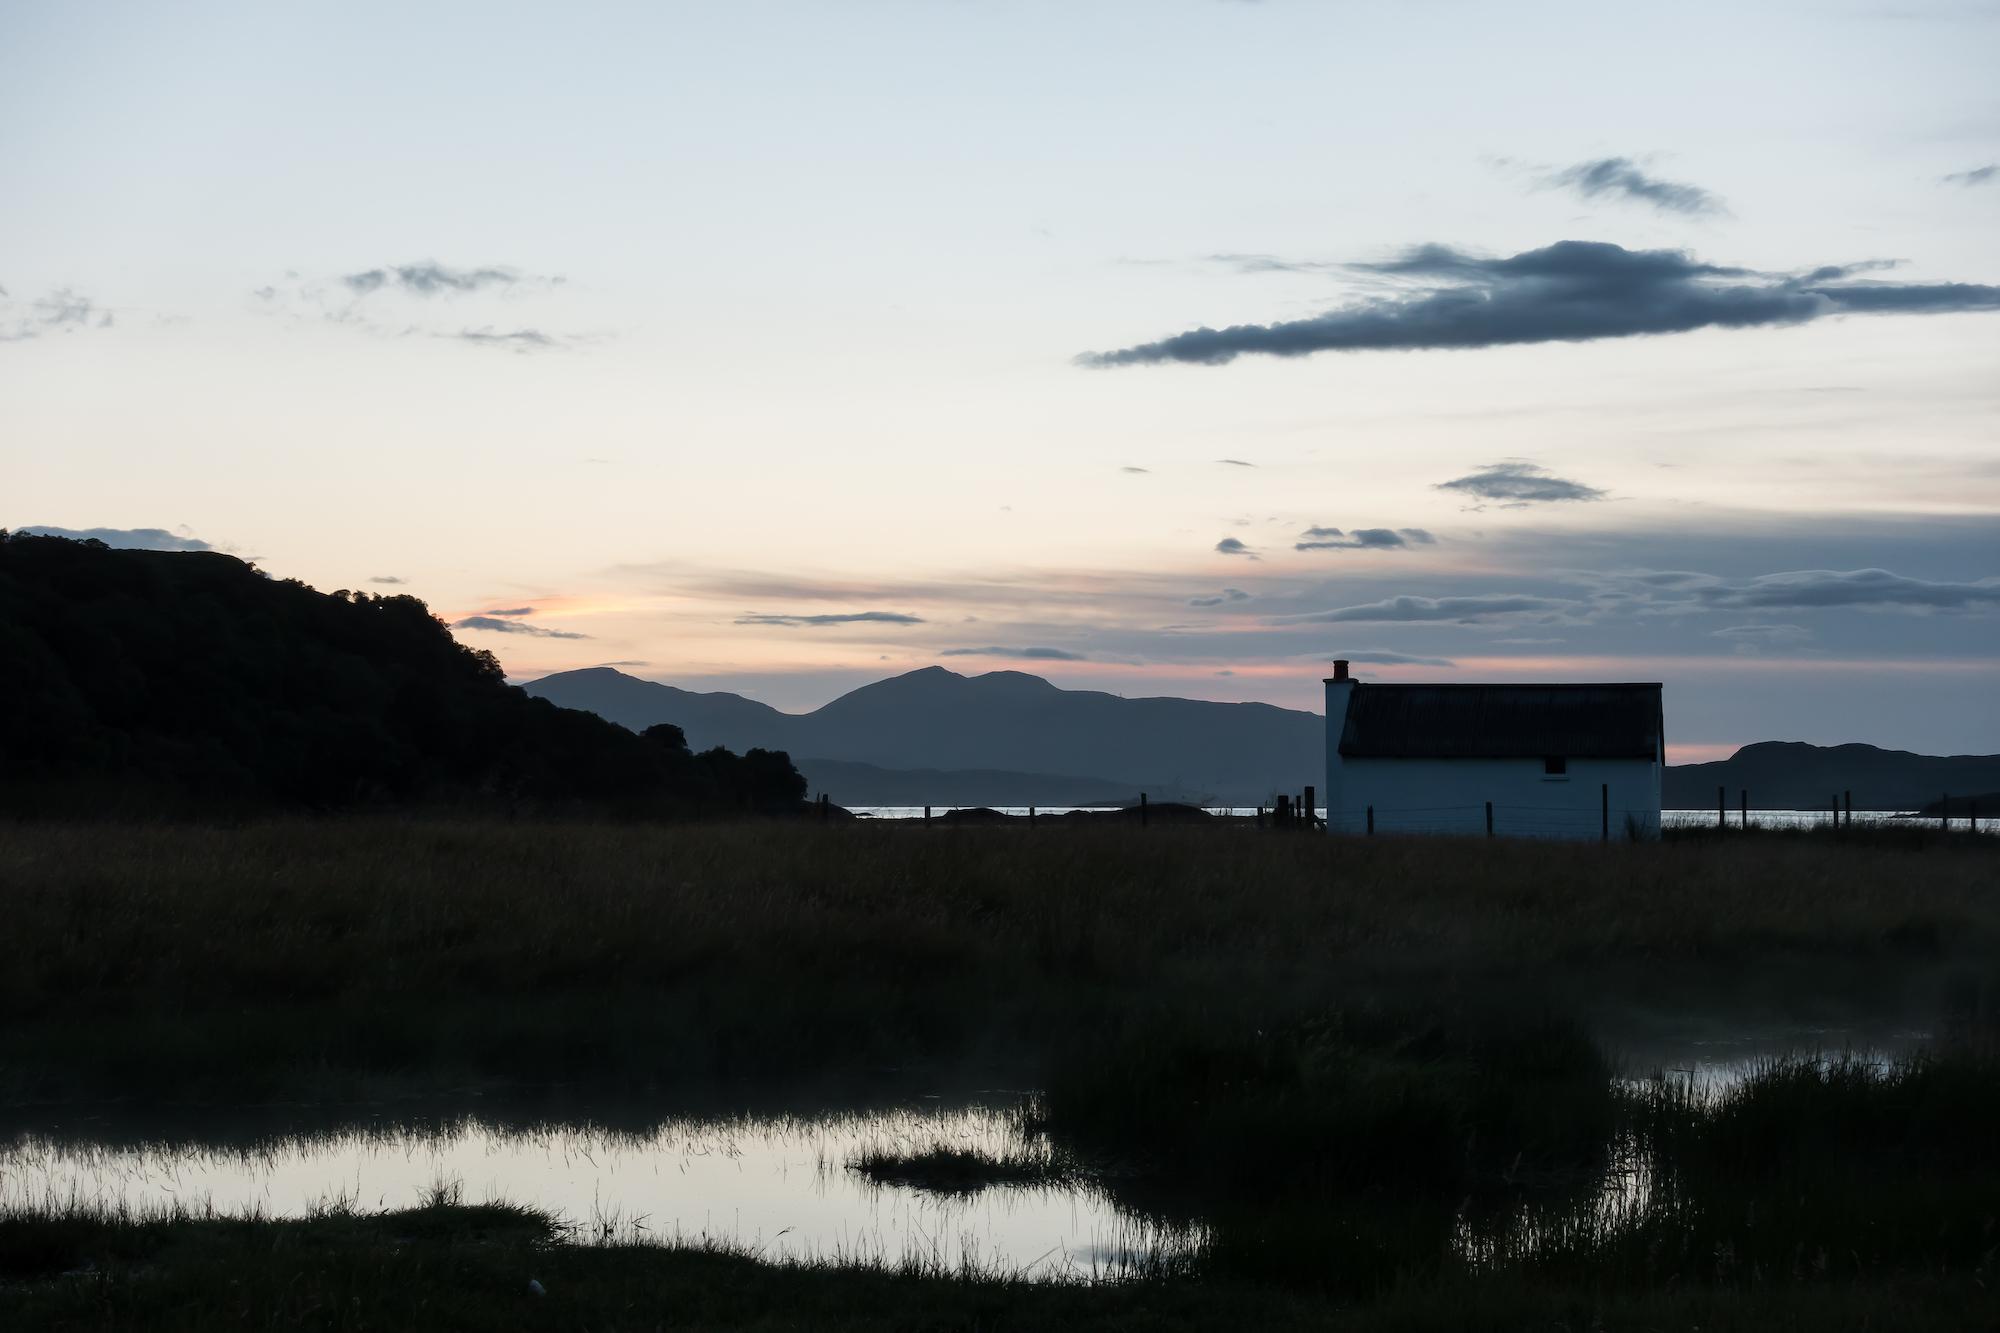 (704) Fishing Station at Loch Feochan, Oban, Argyll and Bute, Scotland. Copyright David Wheater.jpg